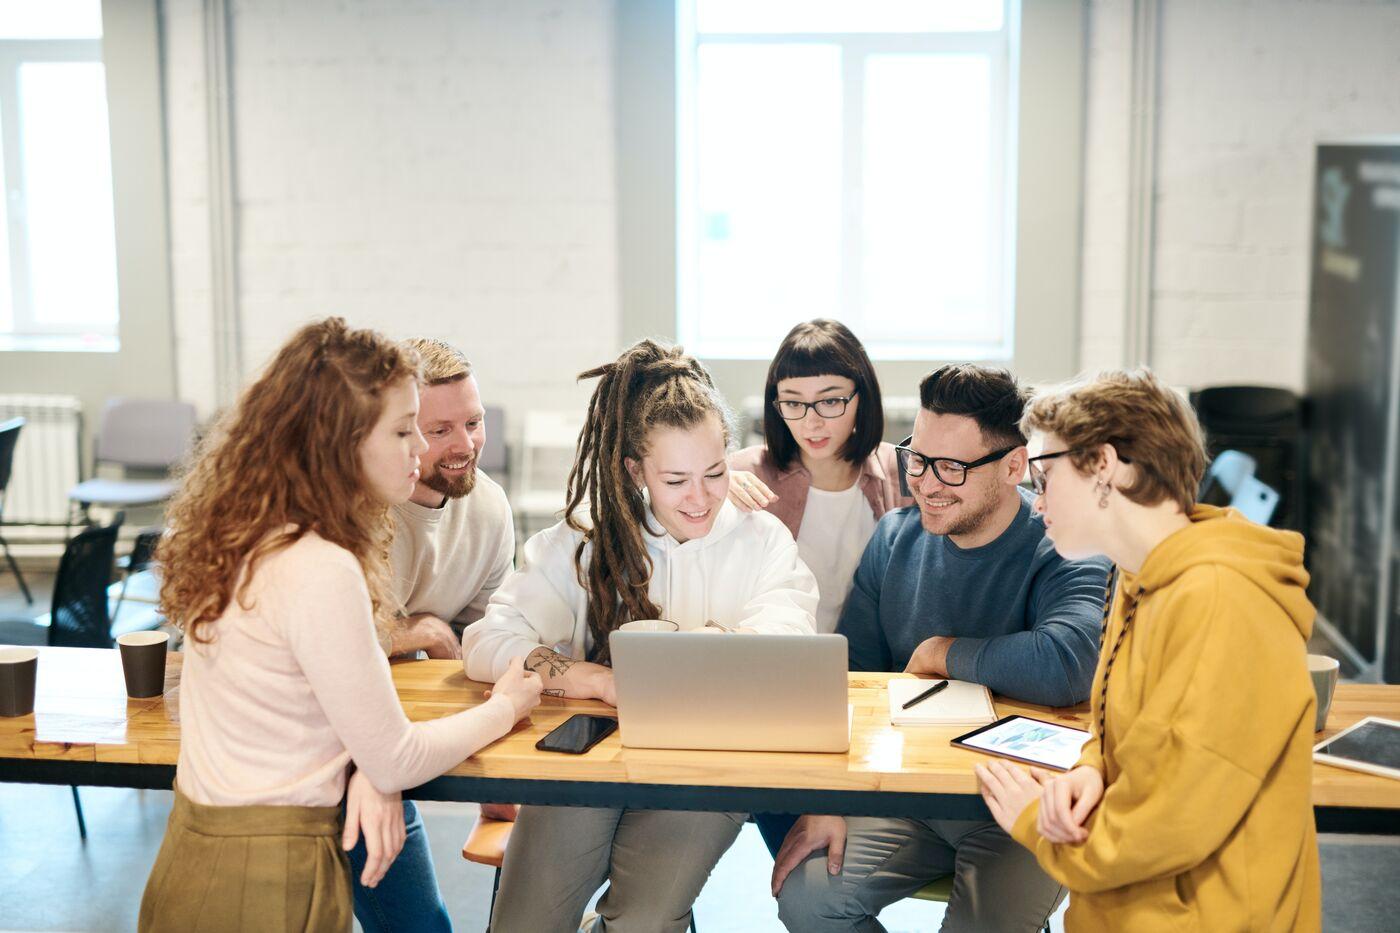 Ausbildung zum Fachinformatiker (m/w/d) - Fachrichtung Anwendungsentwicklung - Job Kassel - Stellenübersicht INTEND Geoinformatik GmbH